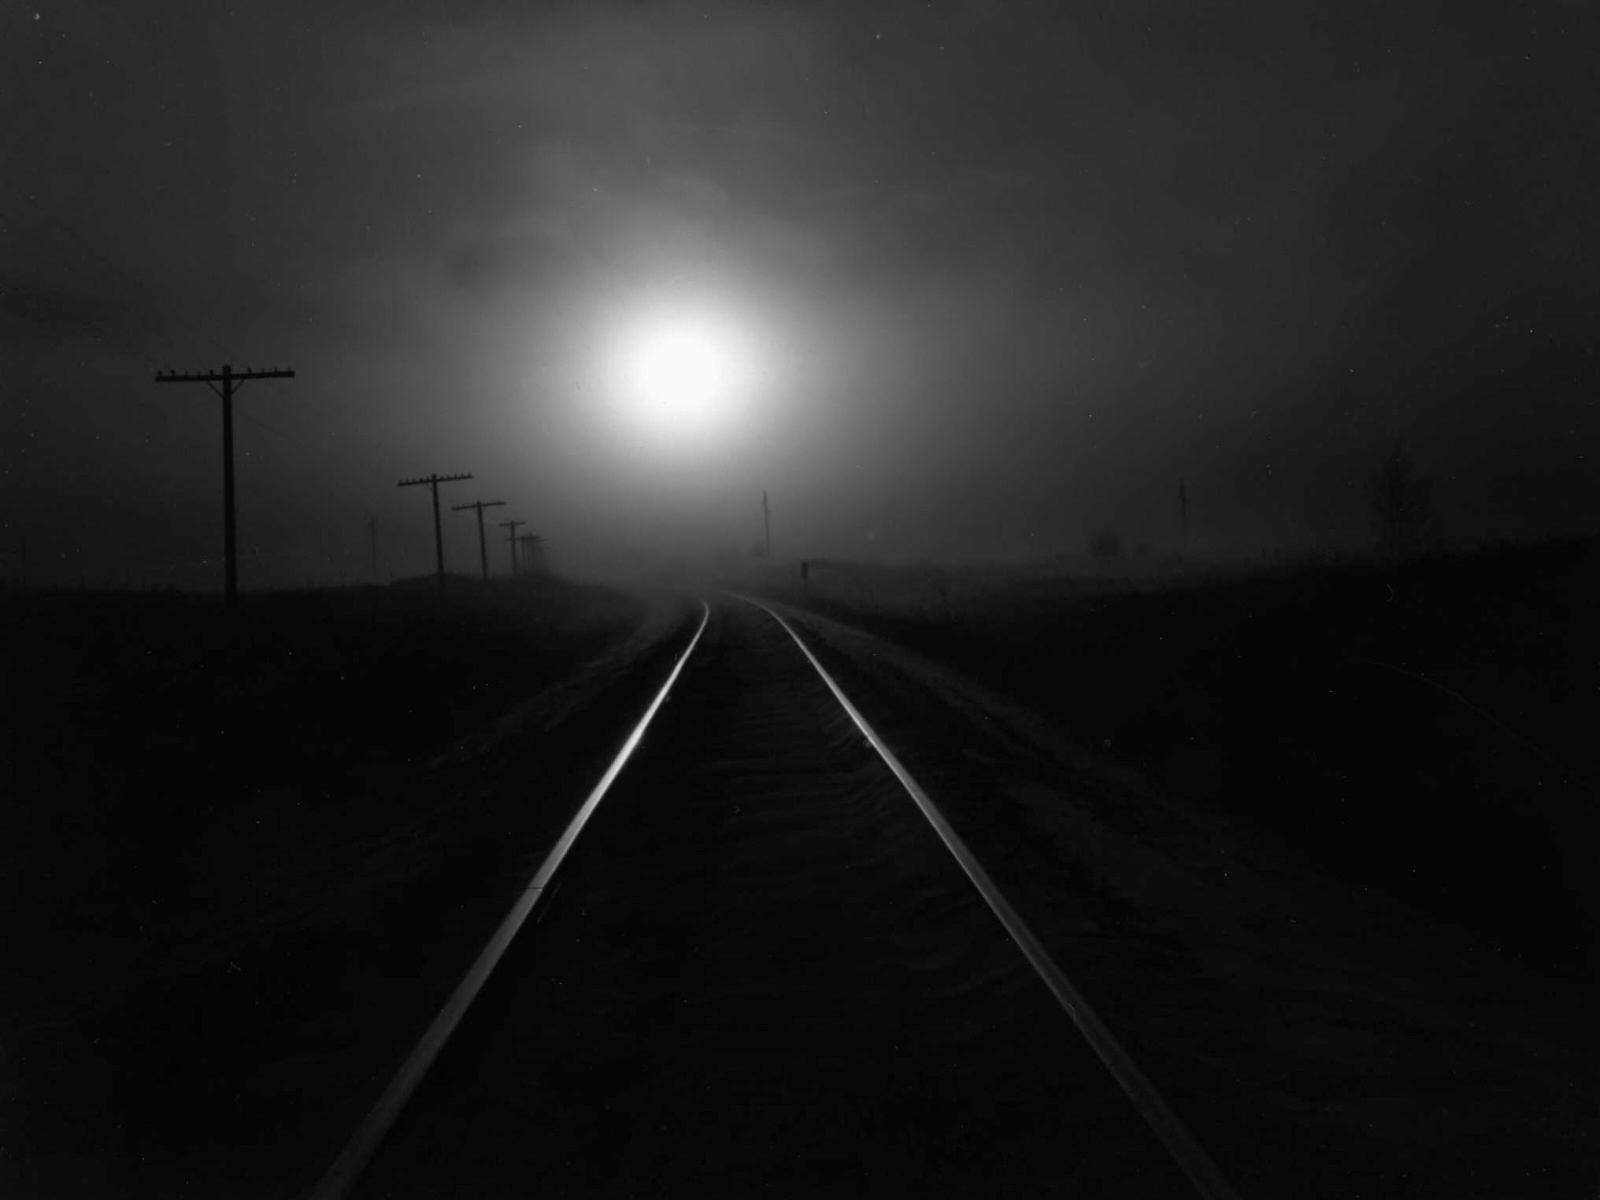 http://1.bp.blogspot.com/-J1Xo8qOTl1s/TkW_llqKk-I/AAAAAAAAATY/qSs0I6fVYr4/s1600/Dark+Railway-266626-908764.jpg